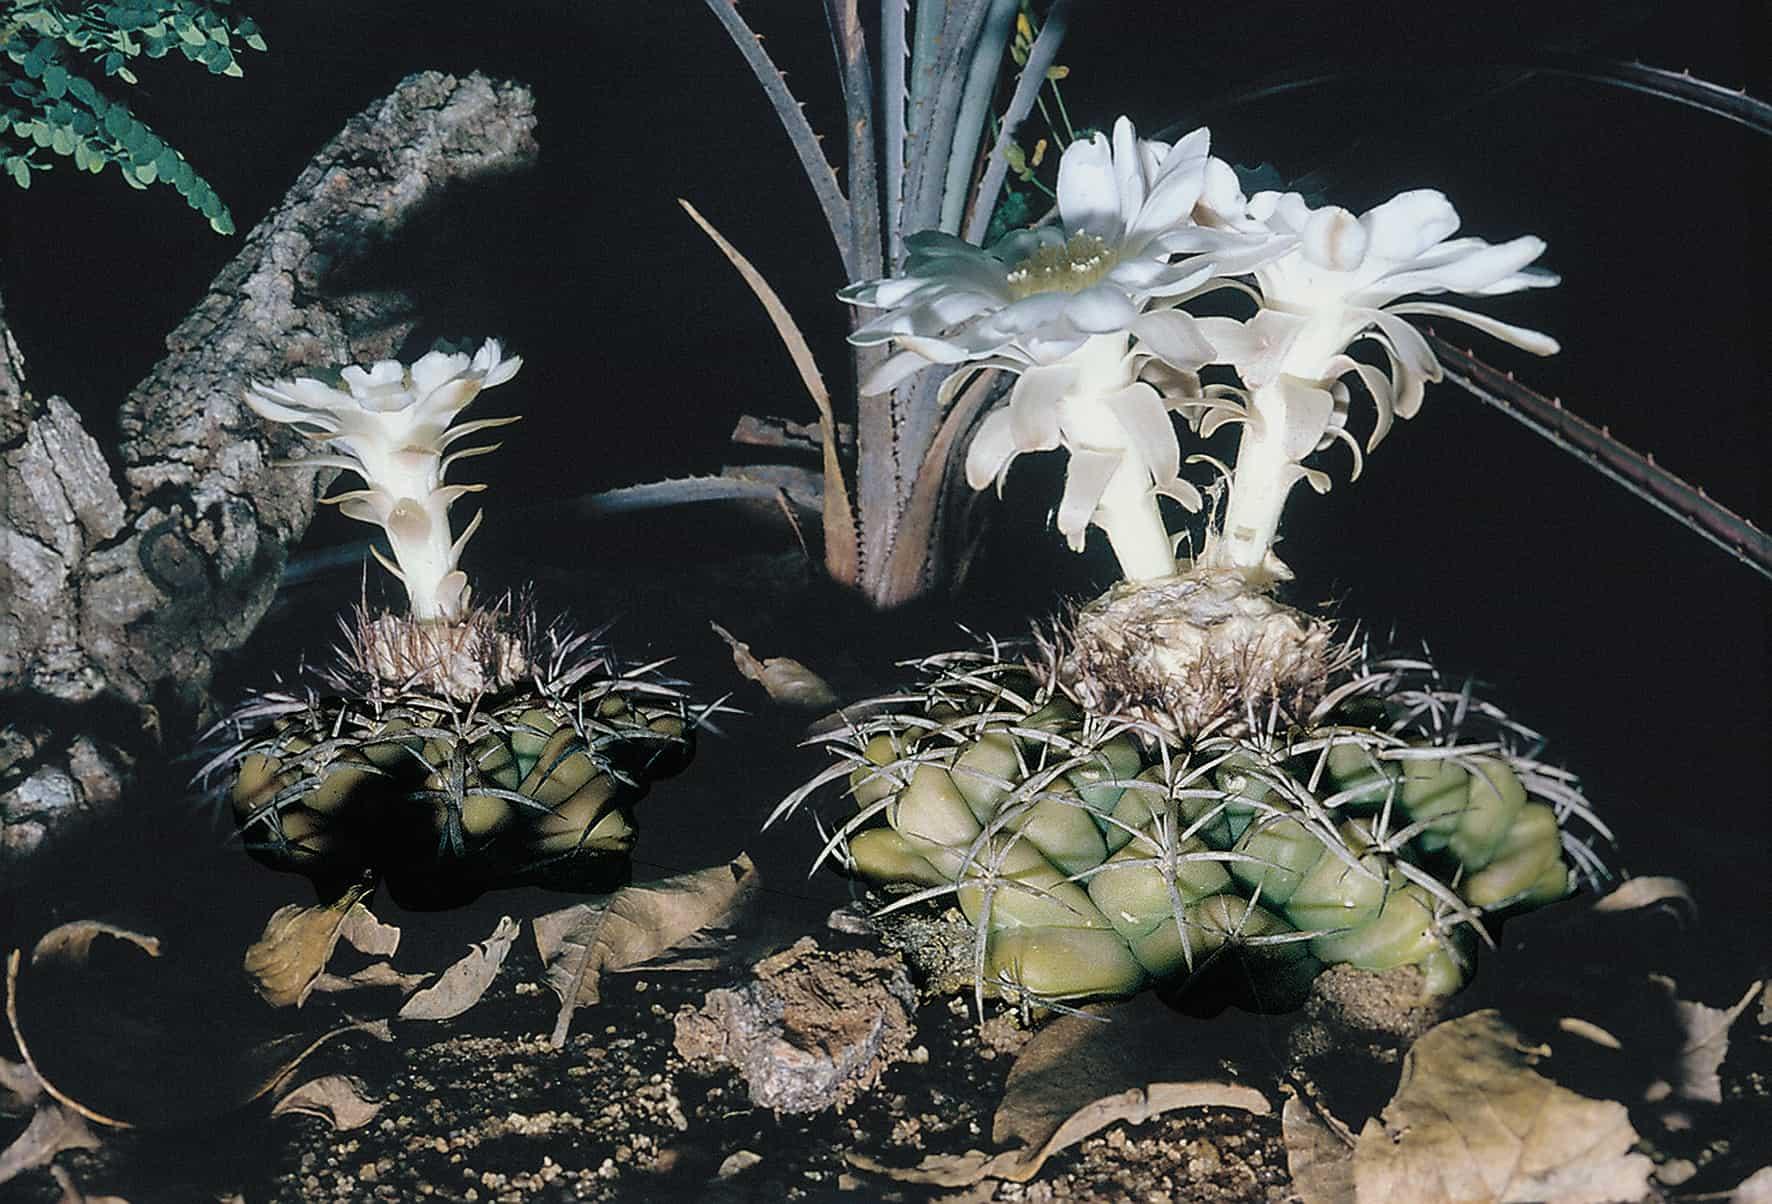 Discocactus subterraneo-proliferans